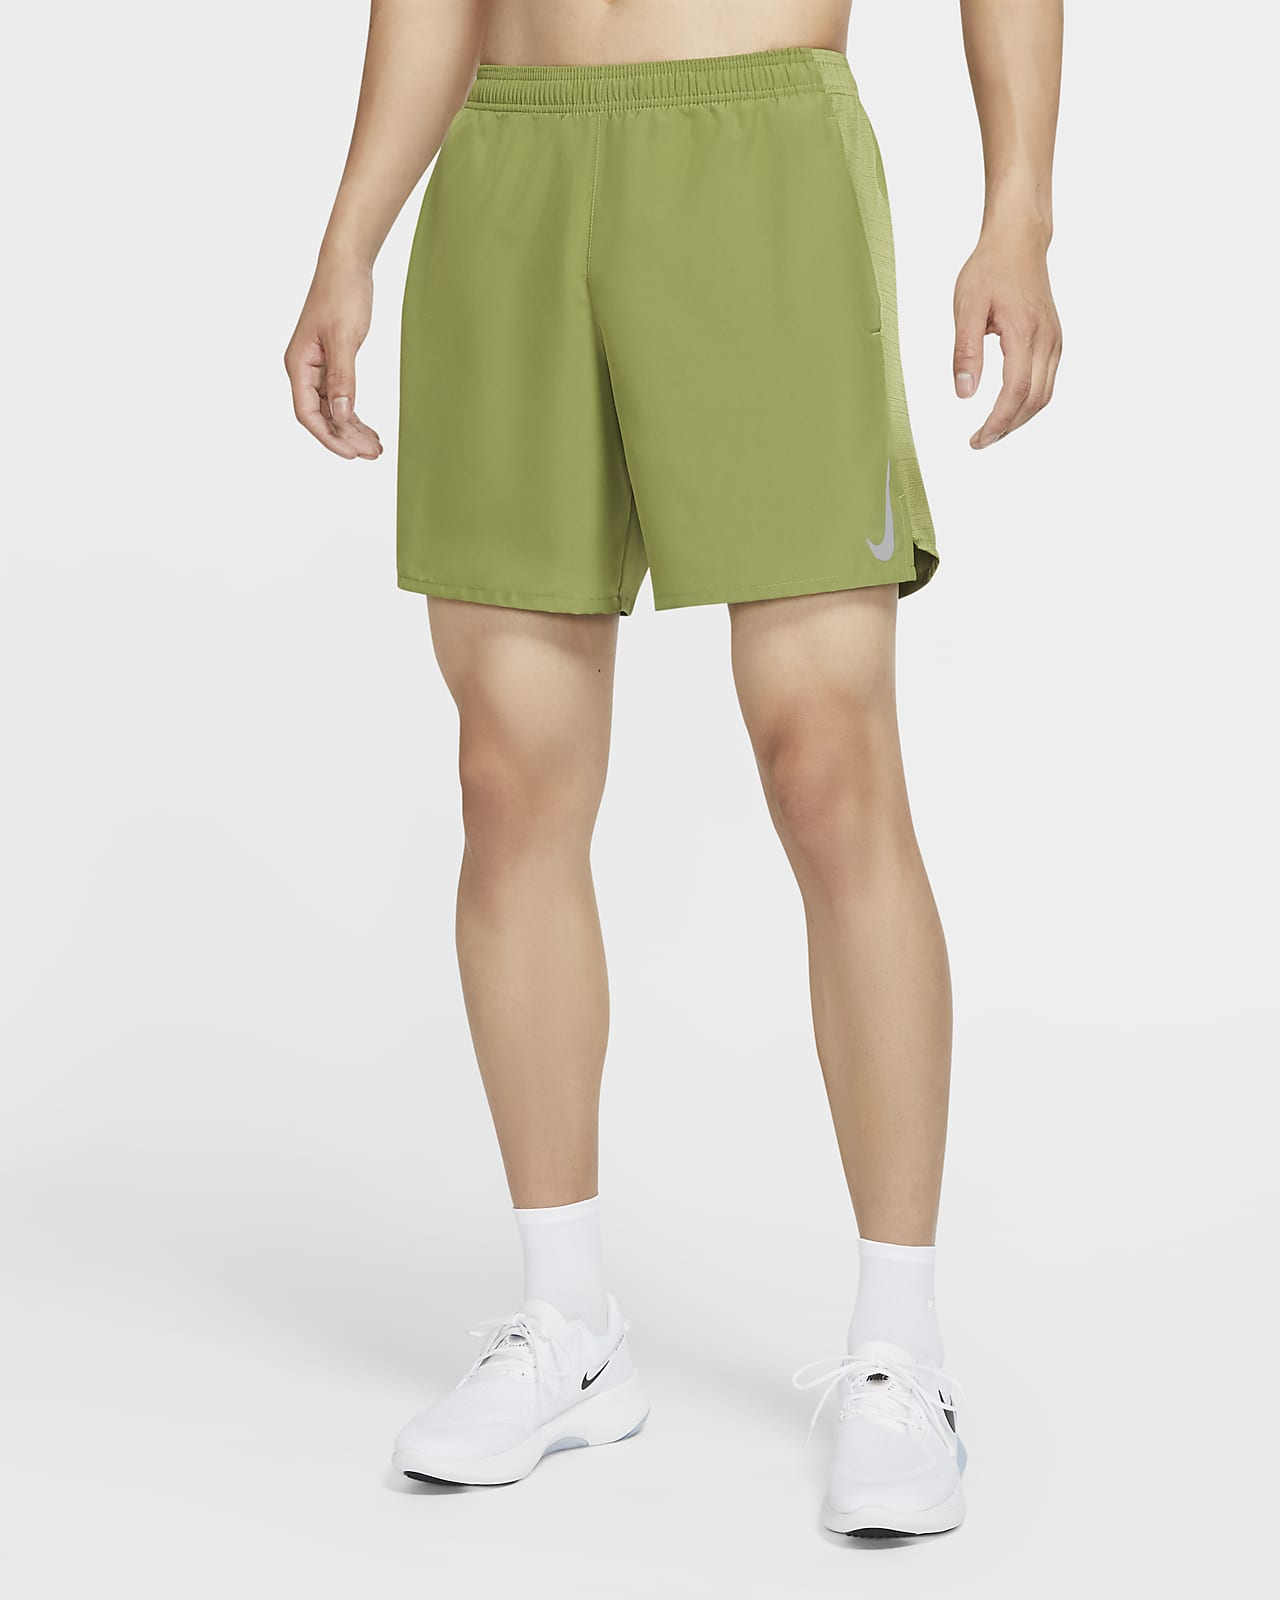 Nike 男子跑步短裤